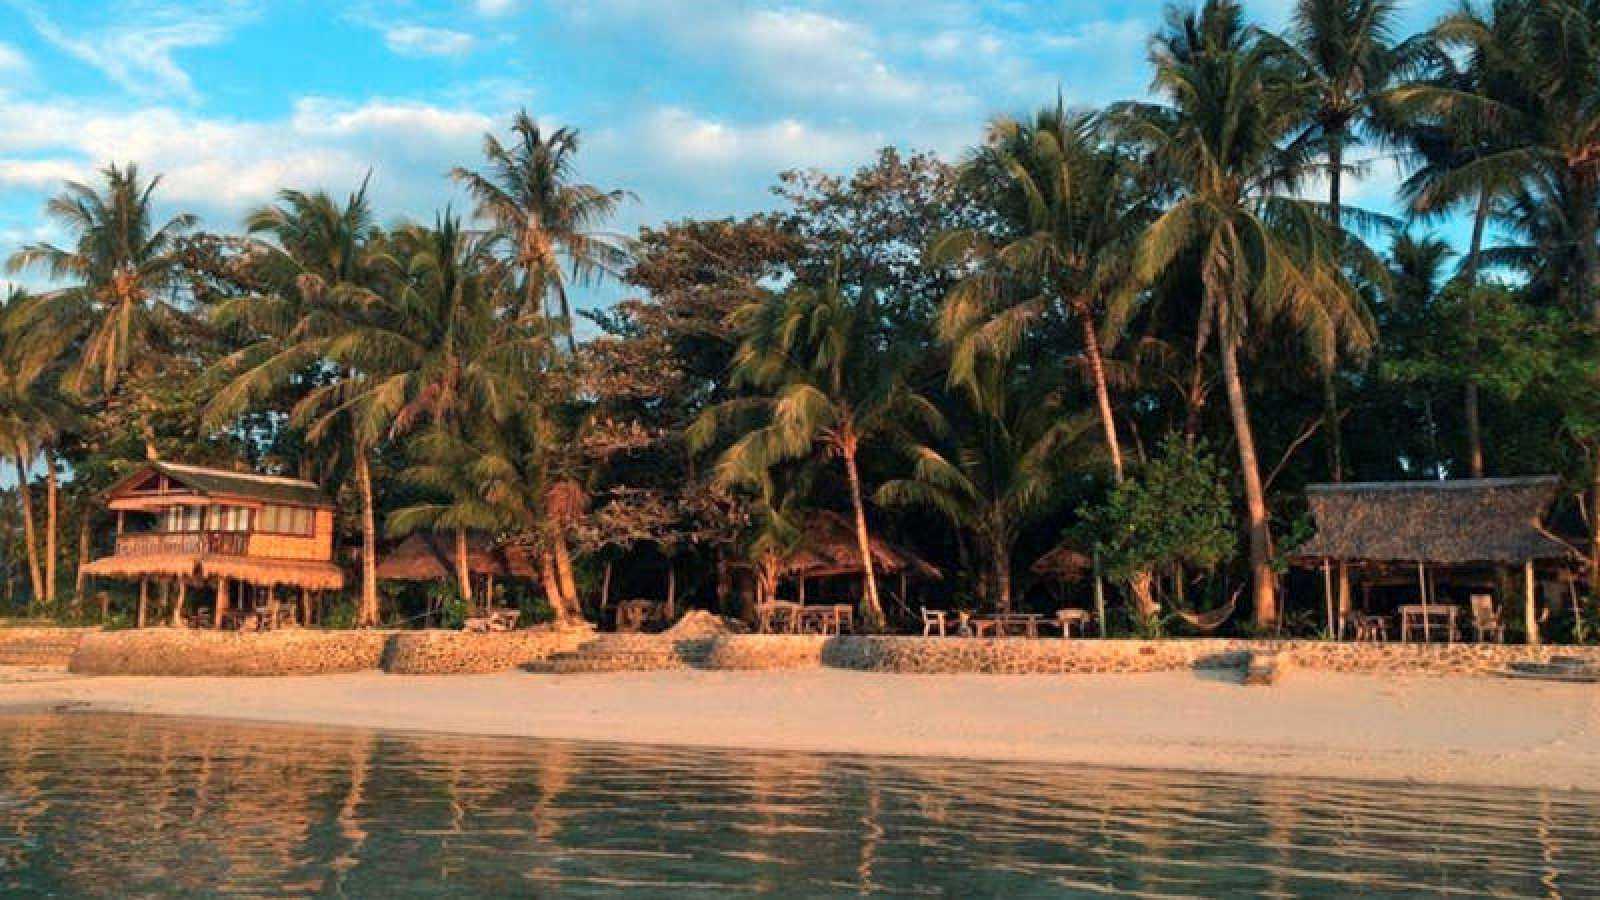 """No importa ser viejo o gordo"": polémica sobre turismo sexual en Filipinas"